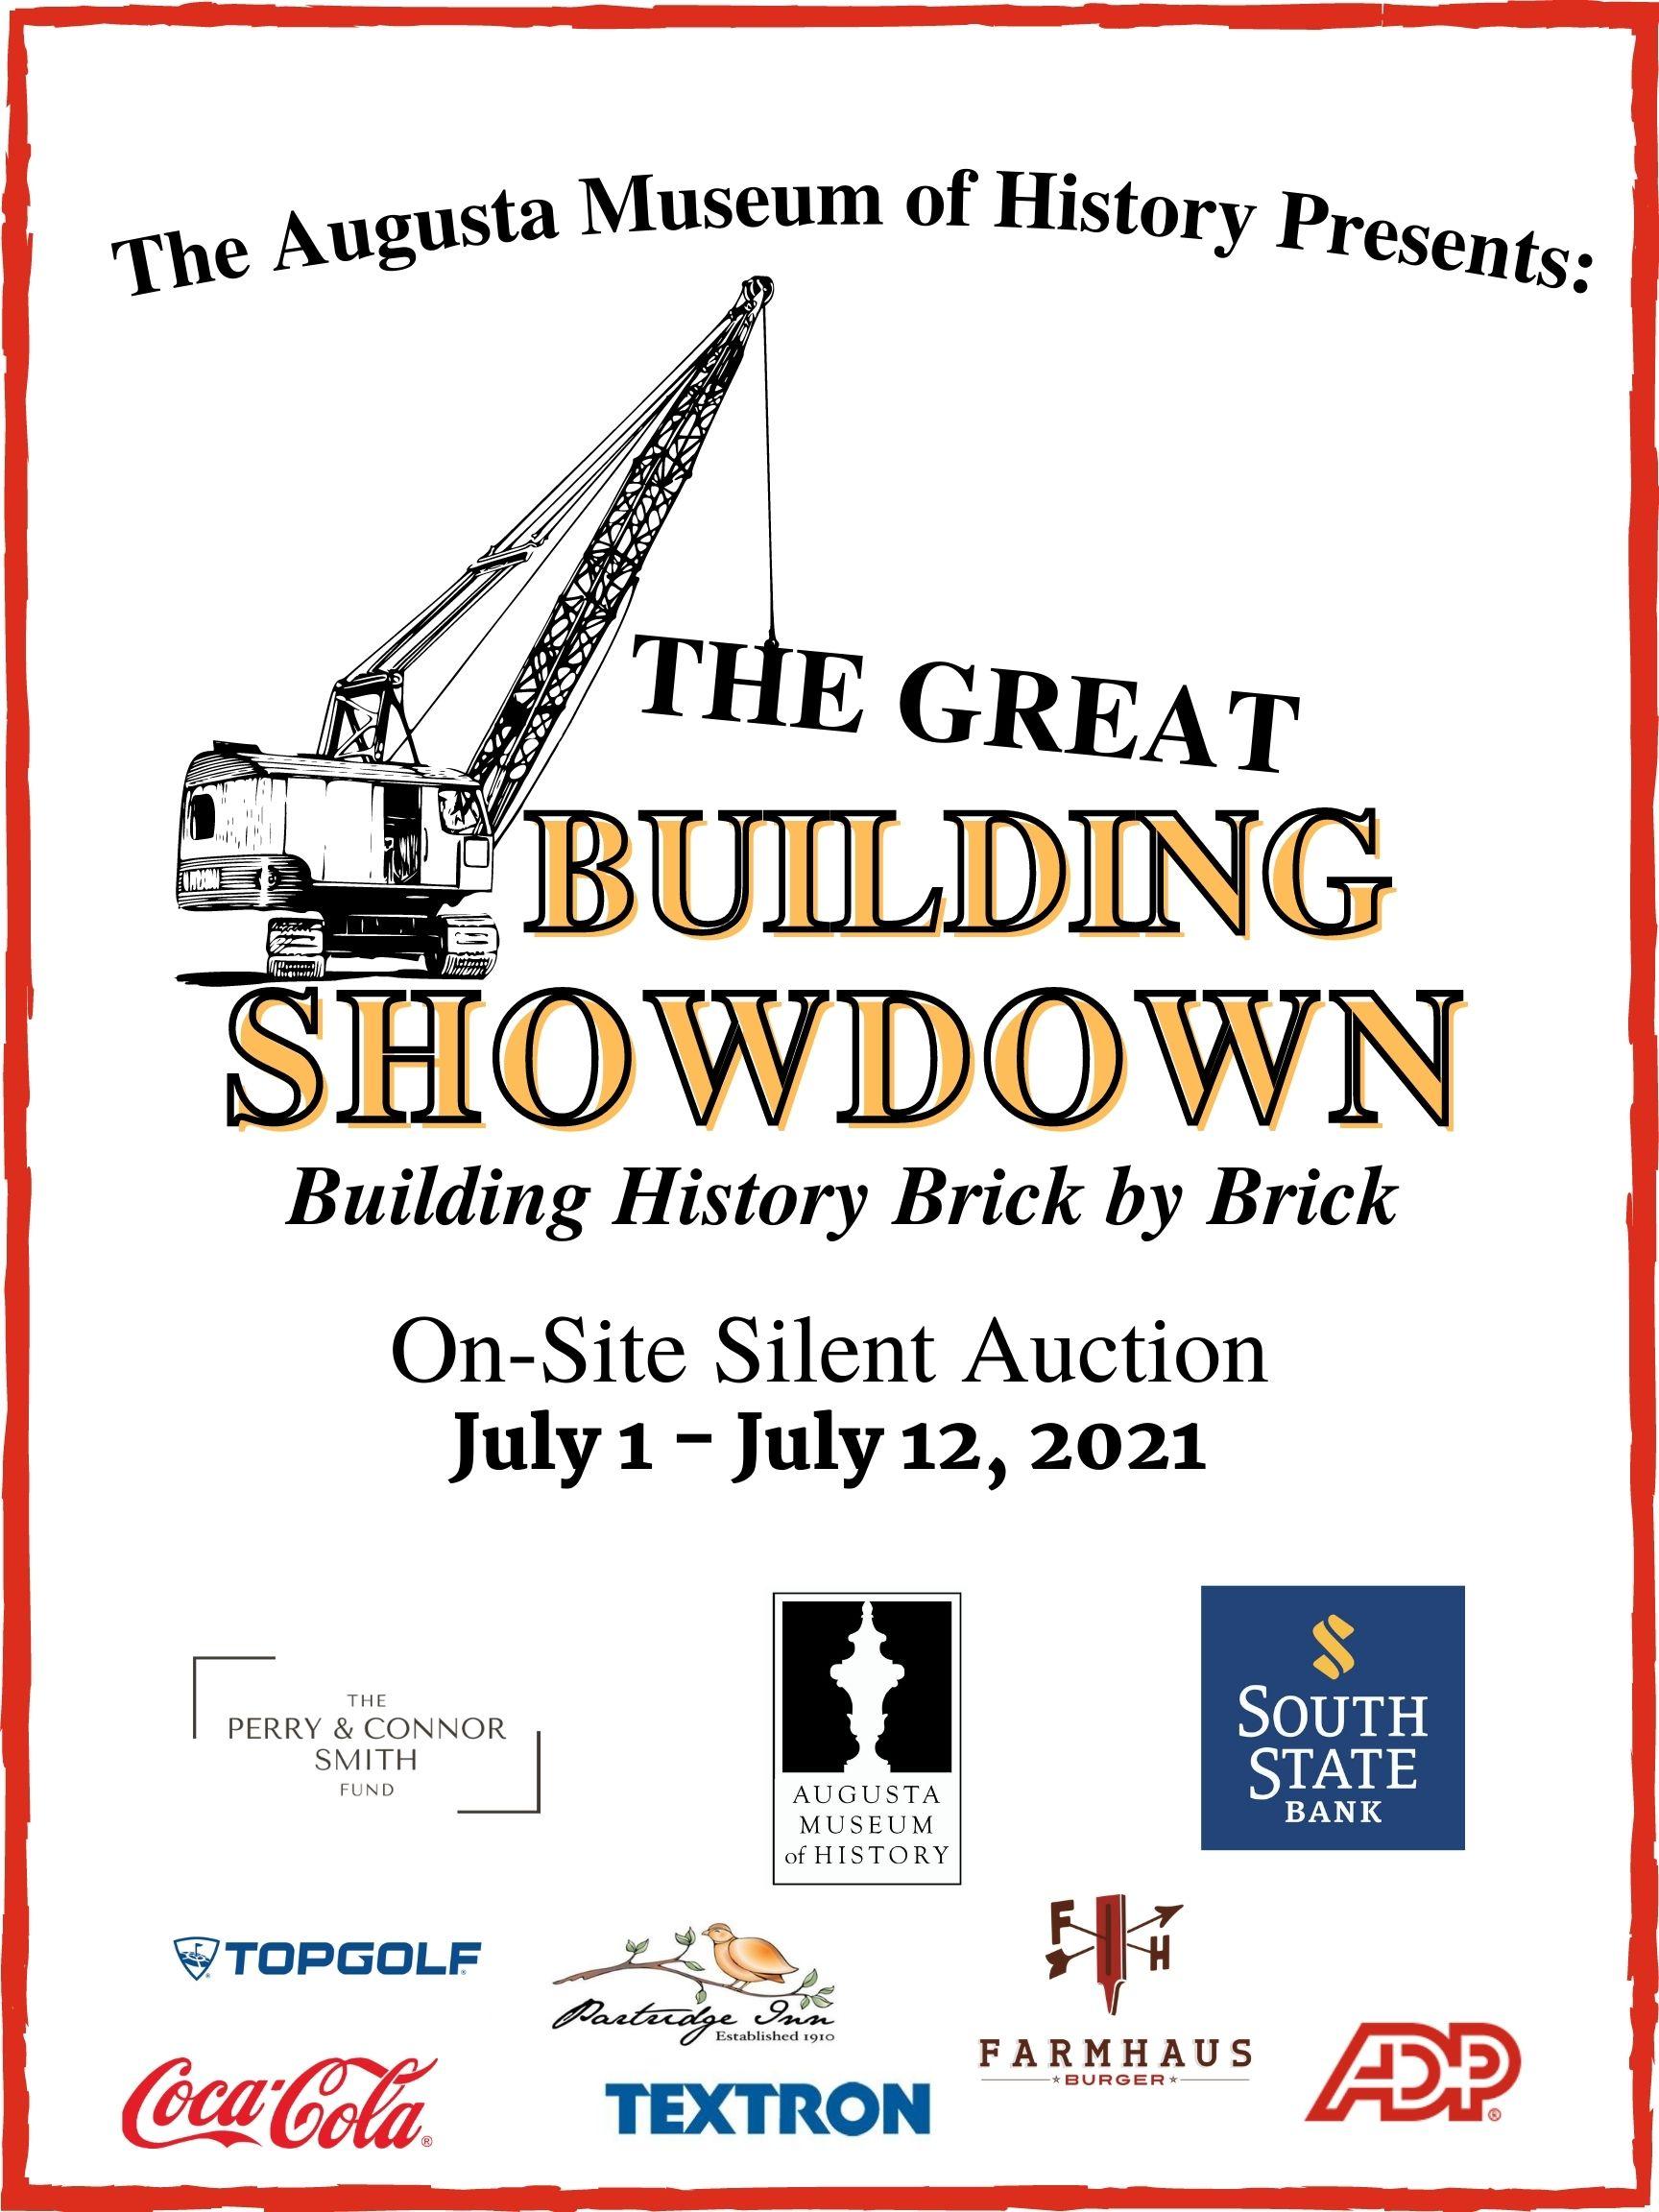 Showdown Flyer   Augusta Museum of History